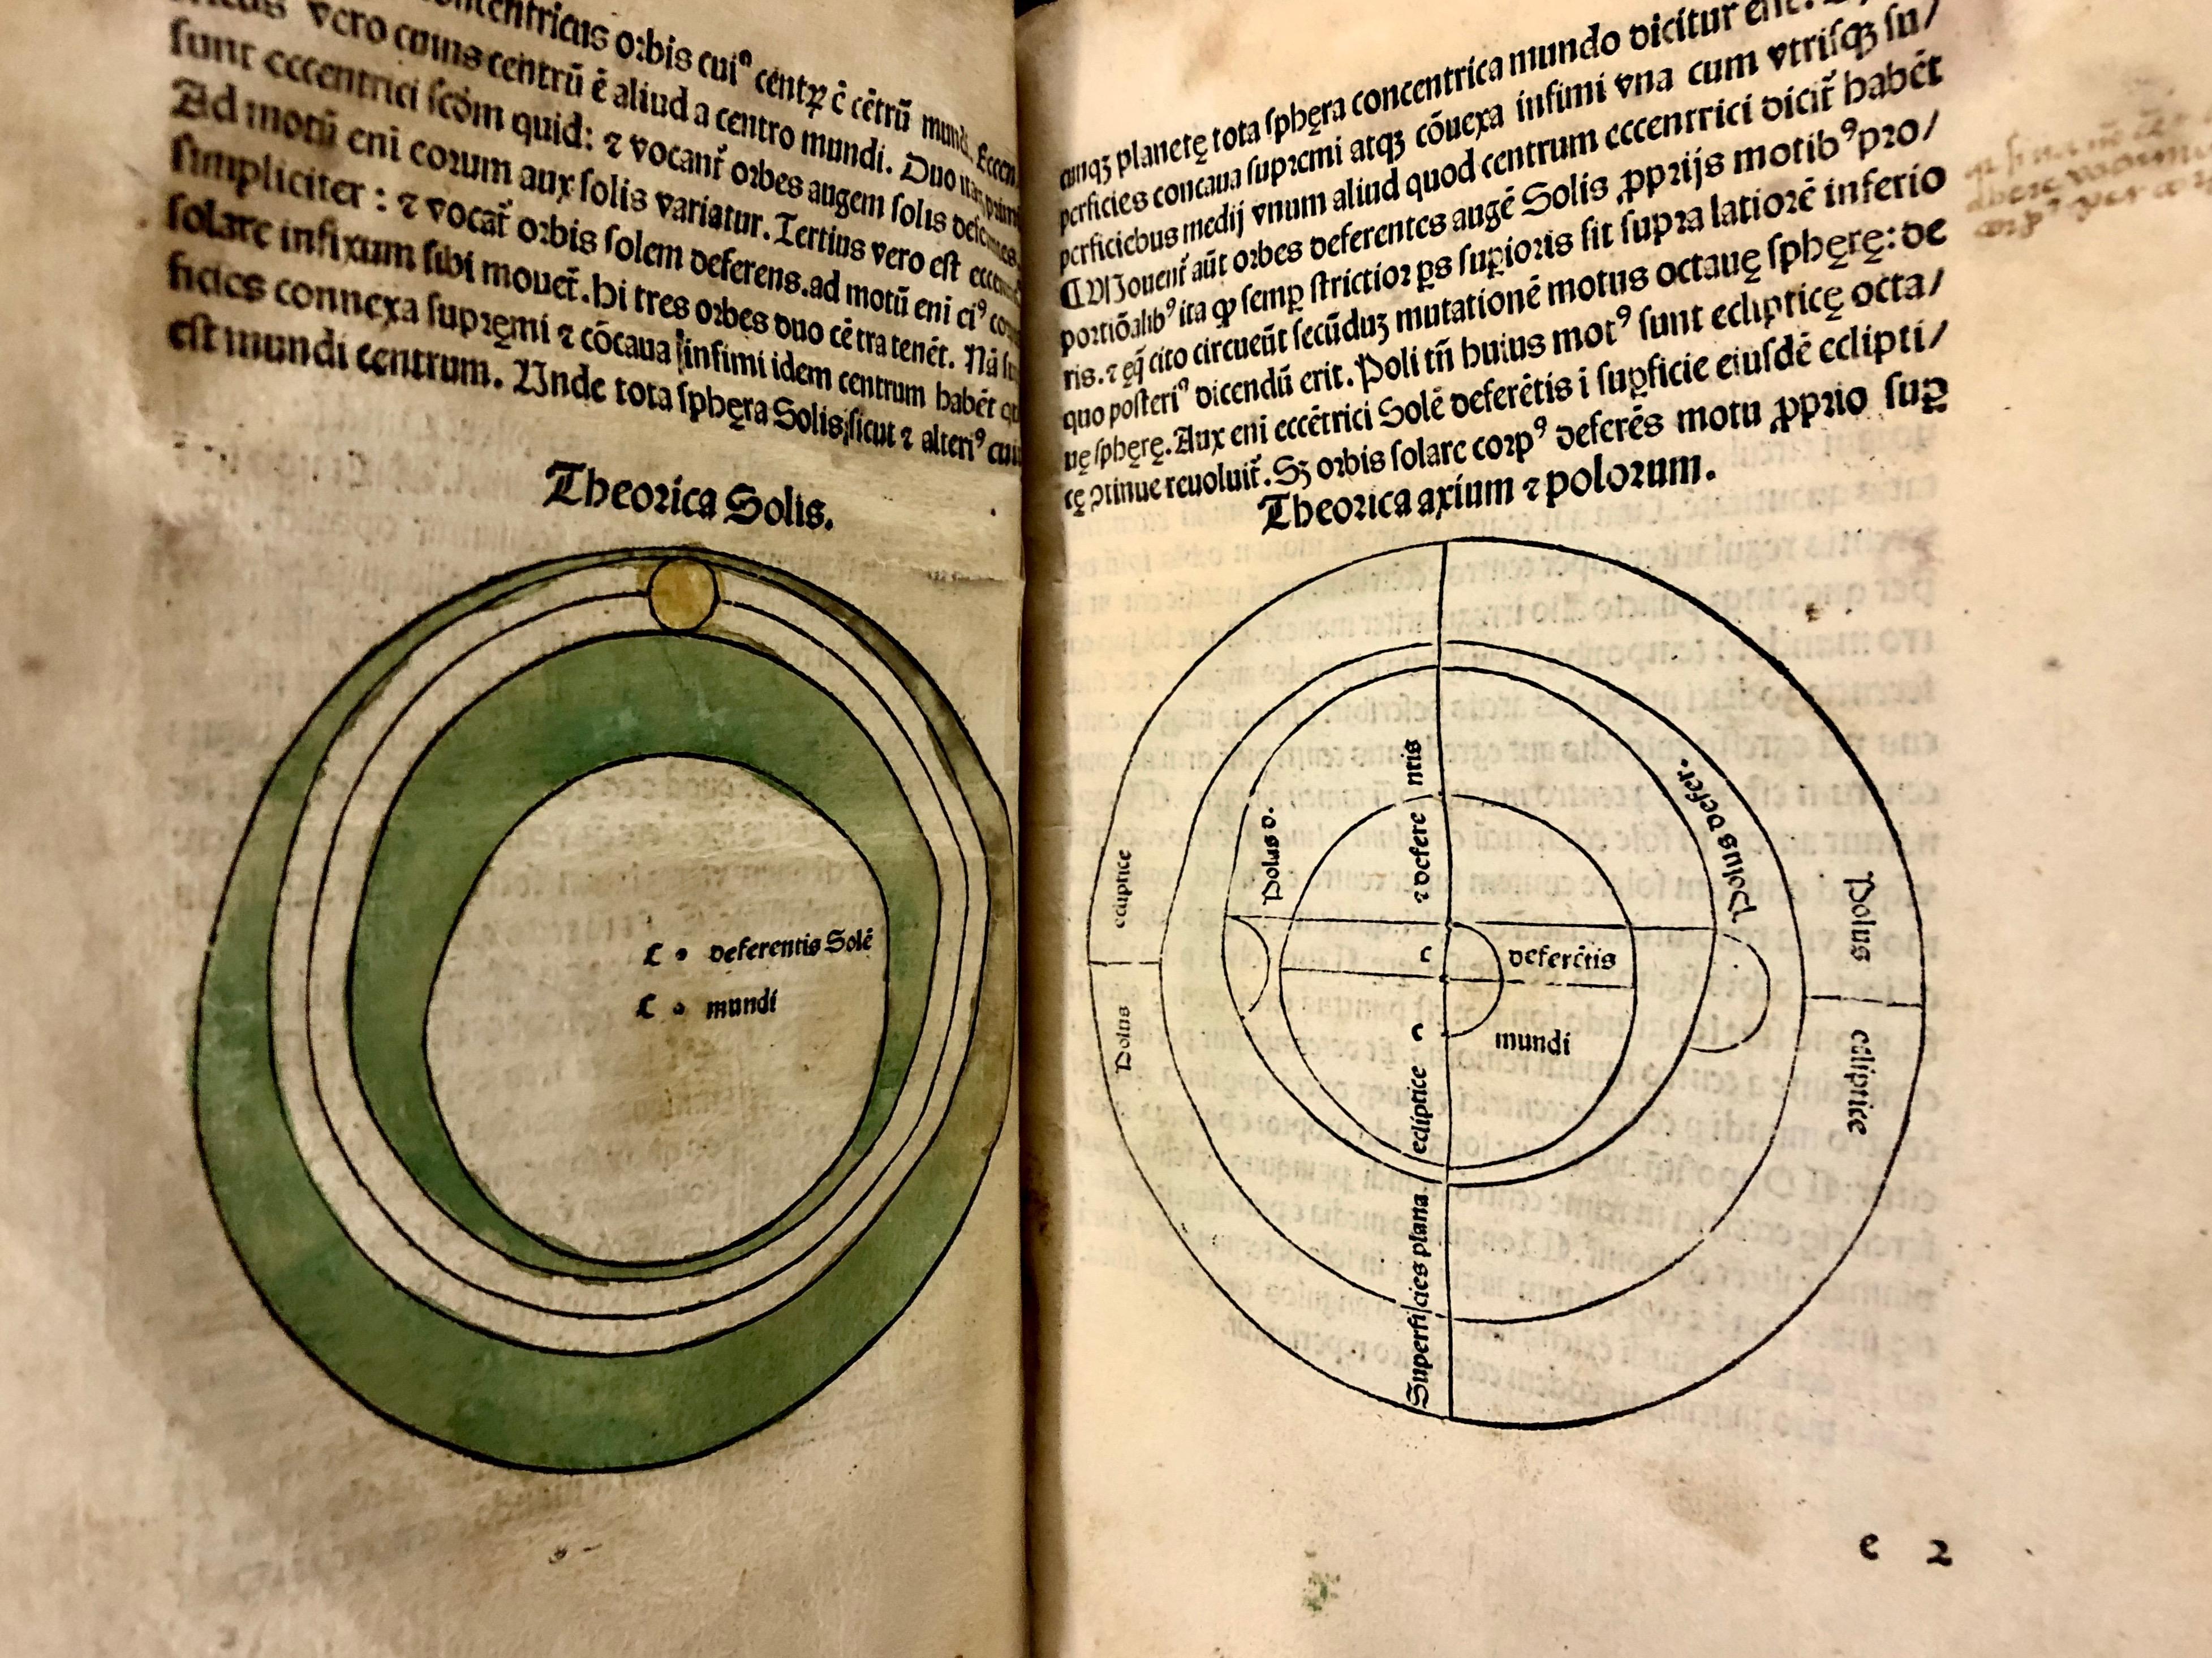 More hand-painted lunar charts in 'Nouicijs adolescetib': ad astronomica remp: capessenda aditu impenetratib' by Johannes de Sacro Bosco, 1482, Venice (Maddison Collection, 1D1)